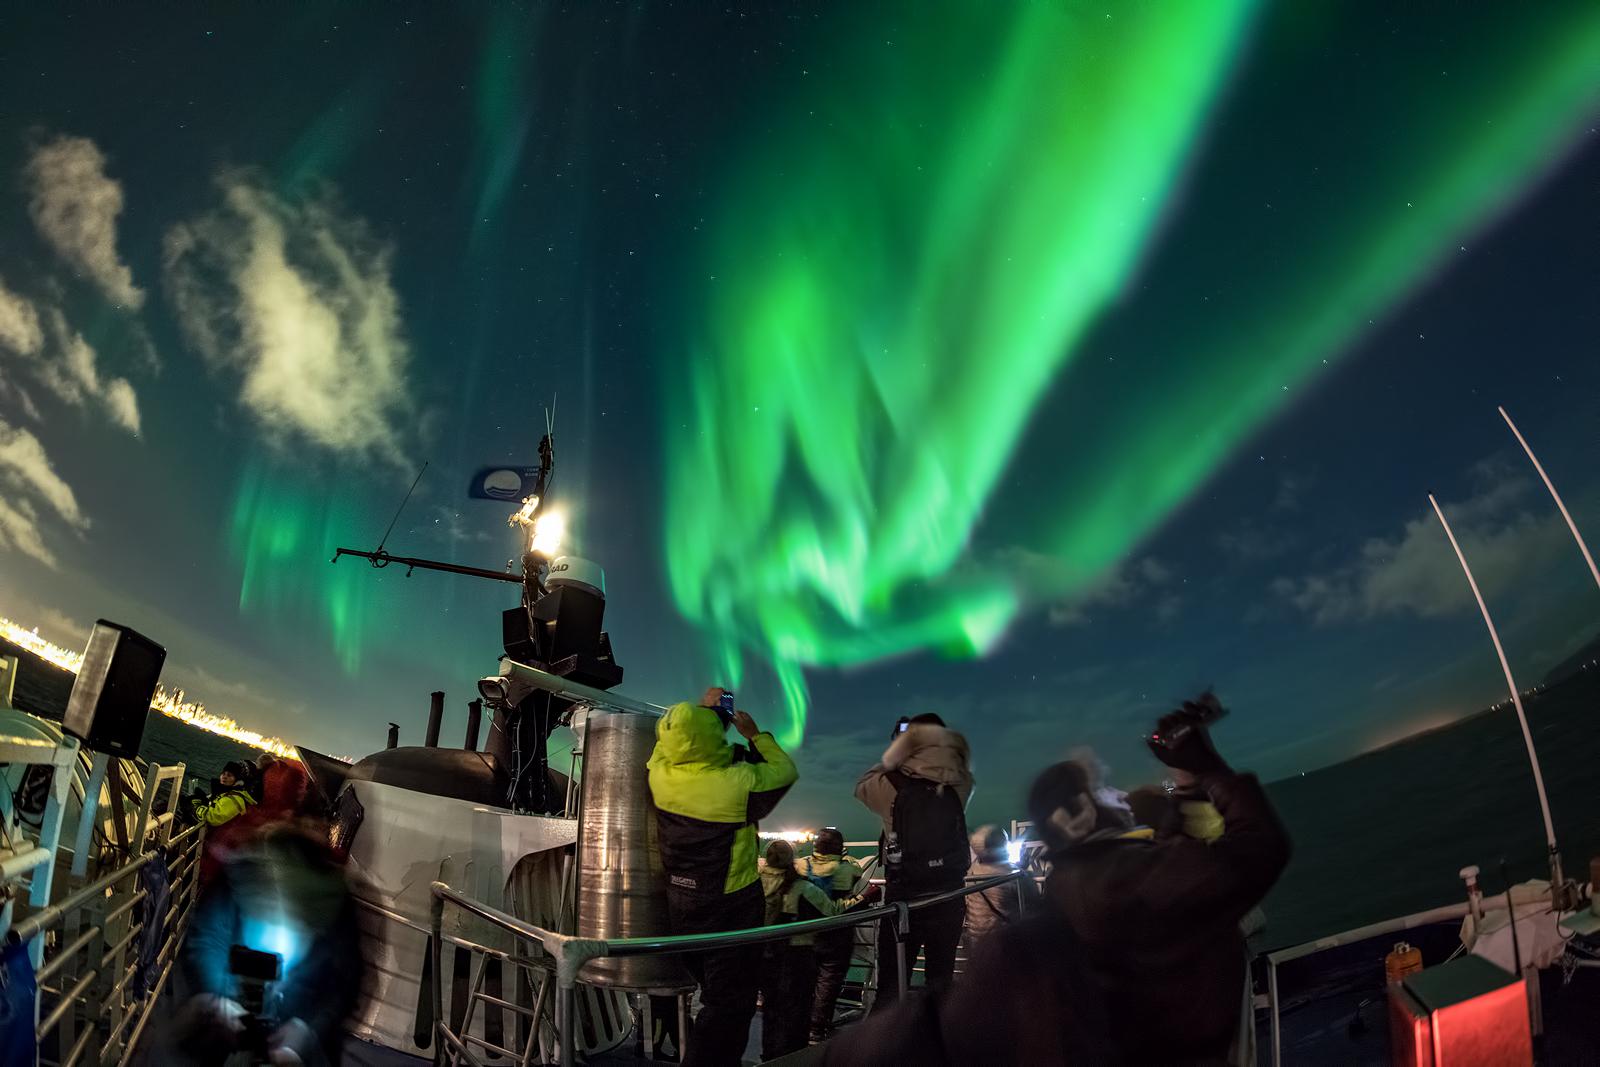 Nordlysbåtcruise fra Reykjavík